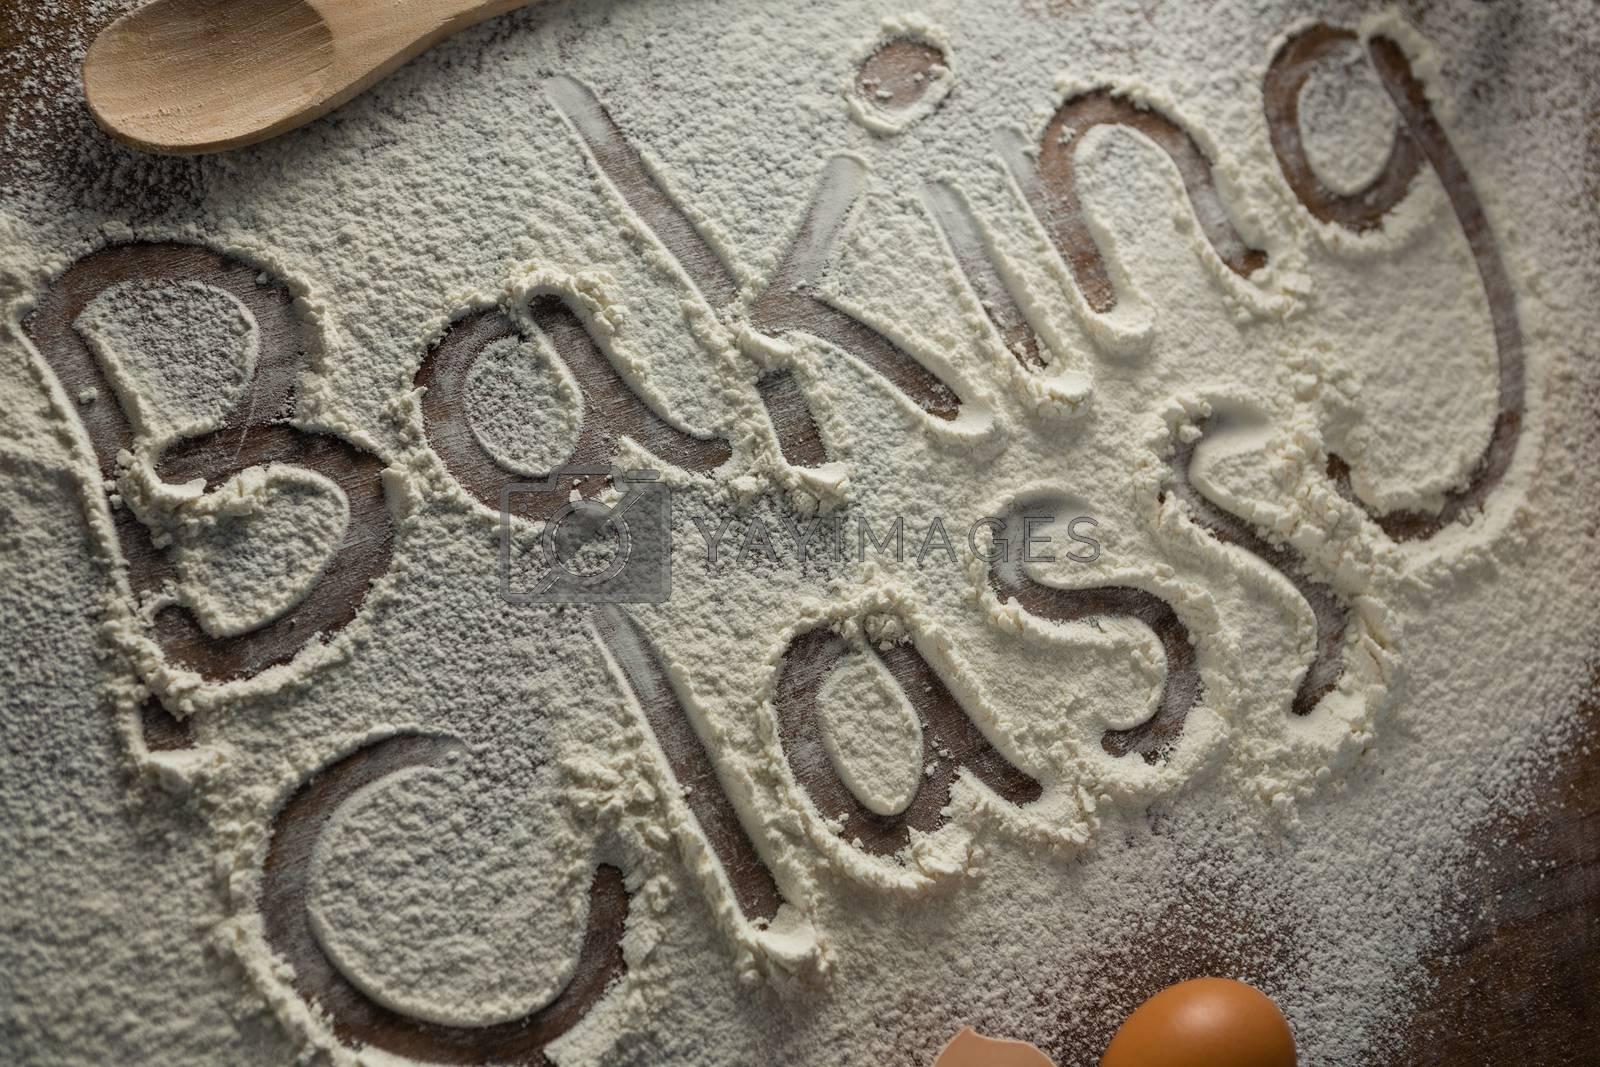 The word baking class written on sprinkled flour by Wavebreakmedia